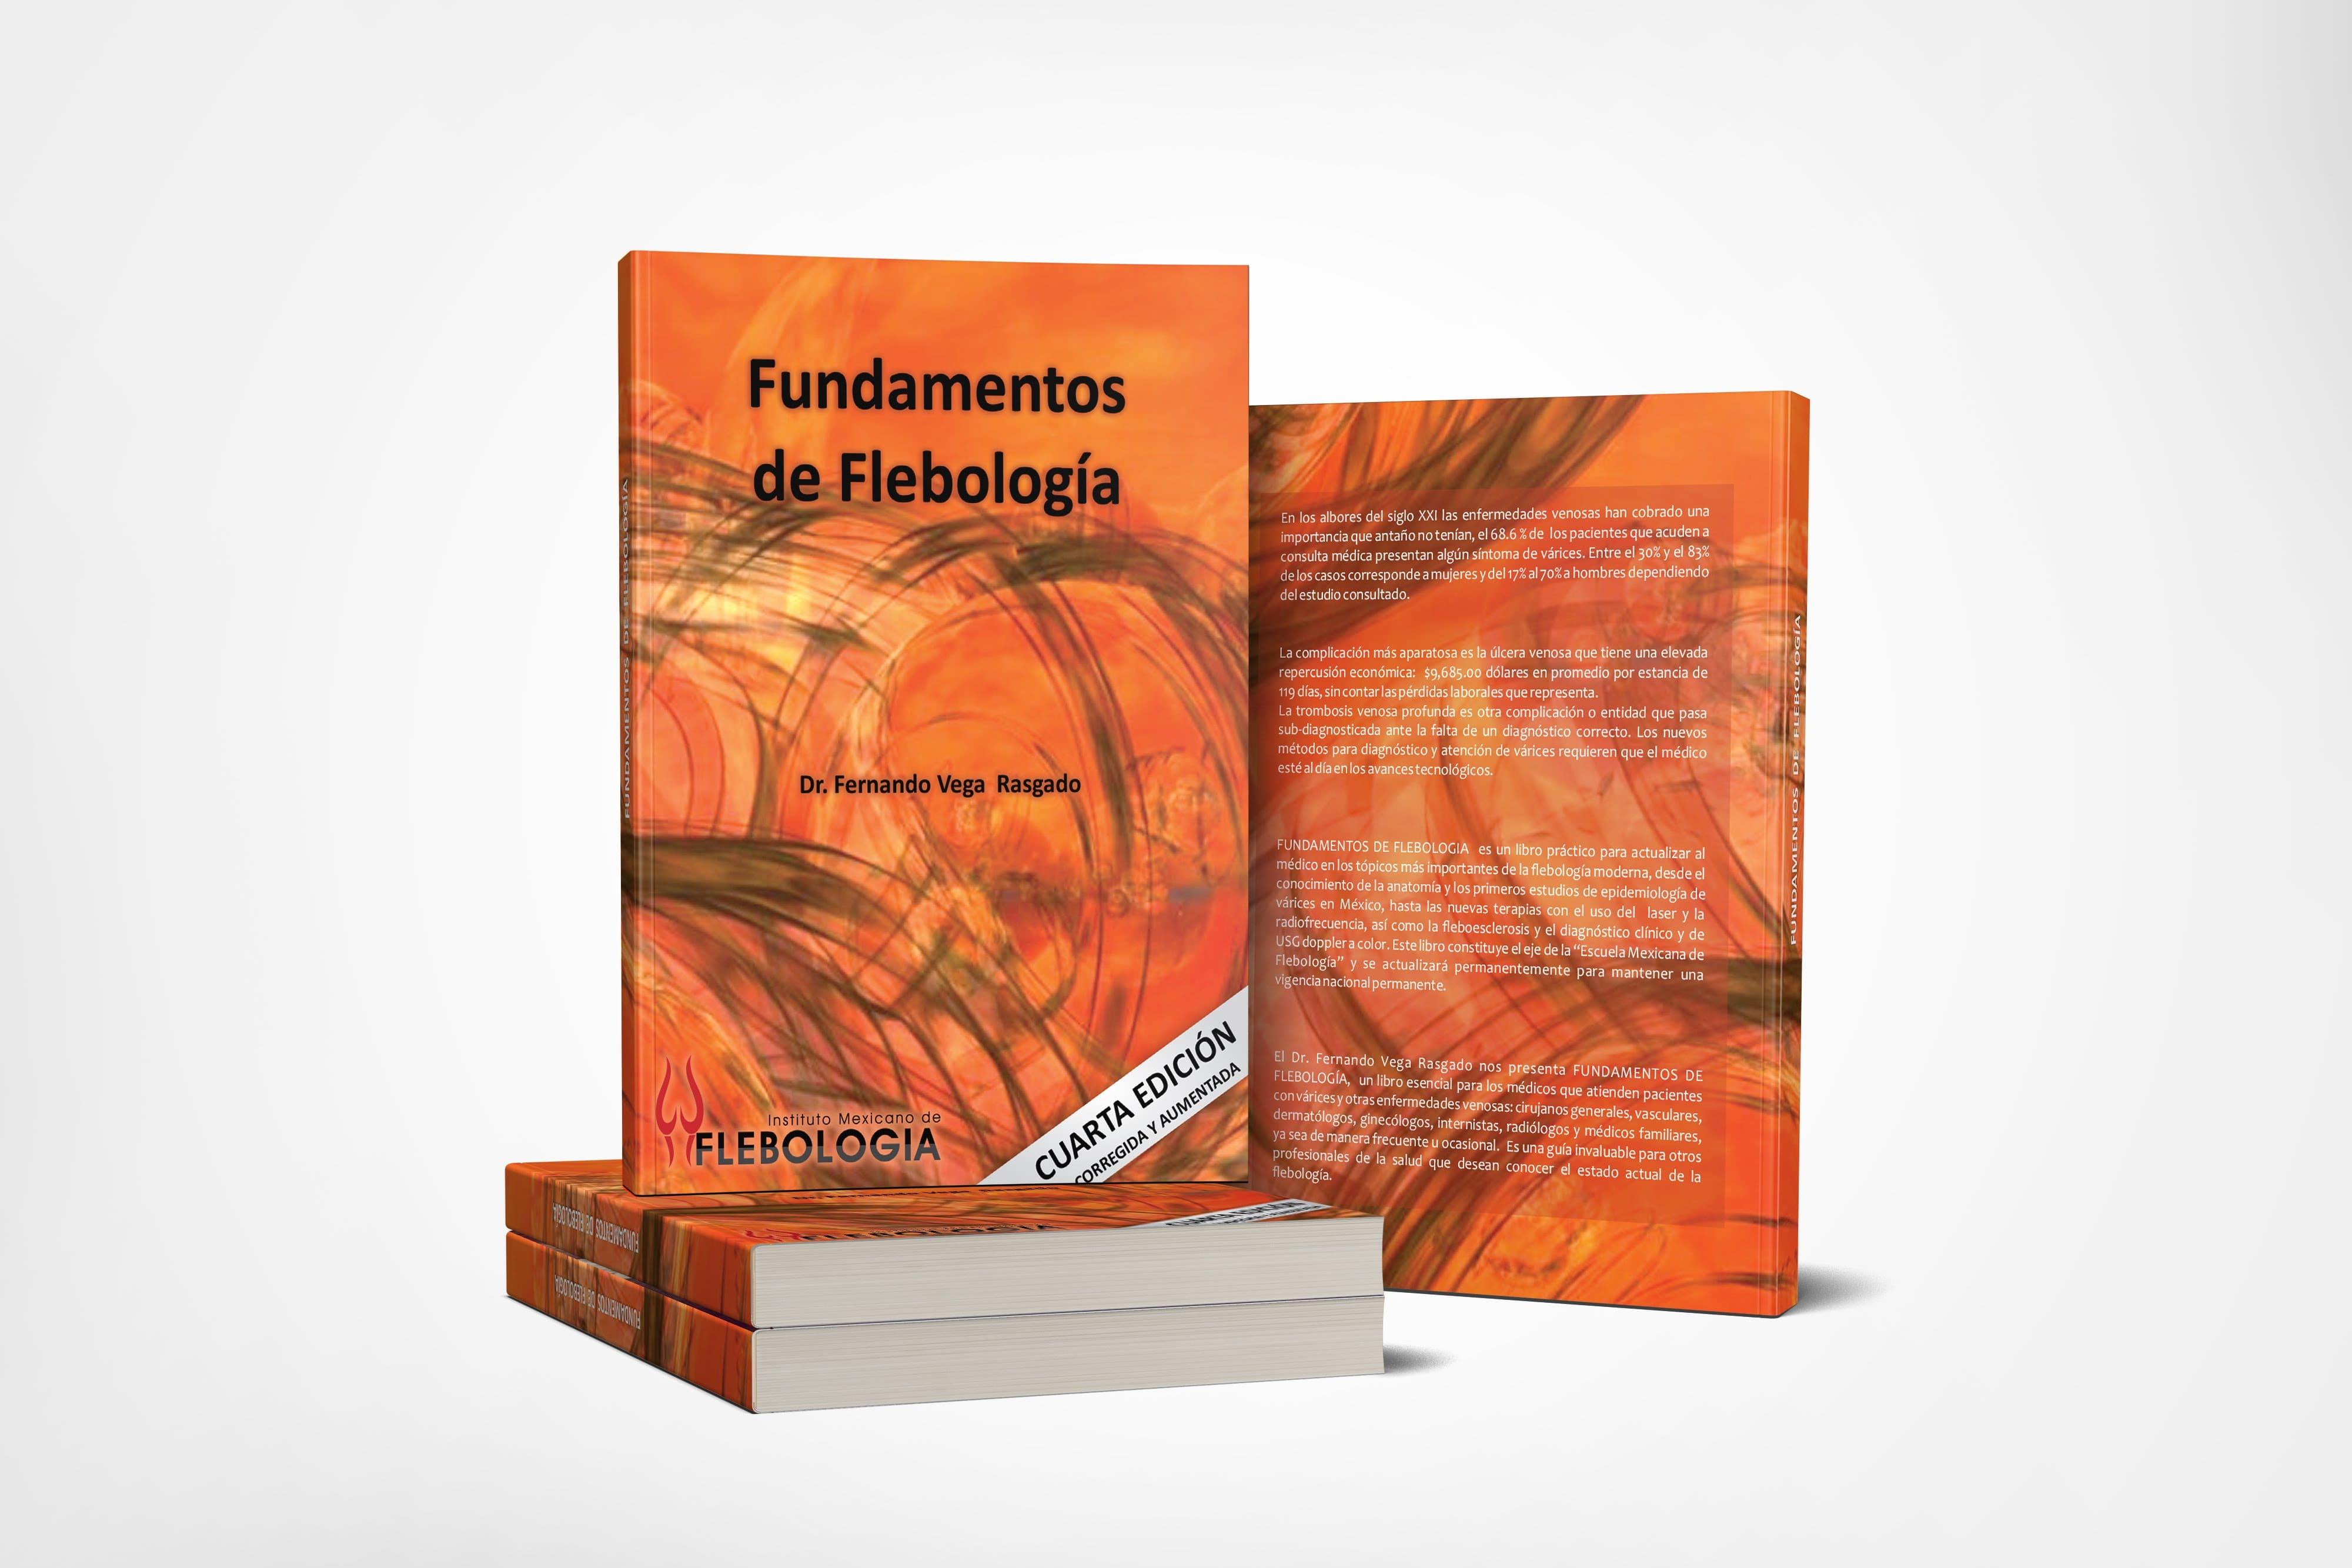 COMPRA YA Libro Fundamentos de Flebología - IMF - Flebología México Instituto Mexicano de Flebología